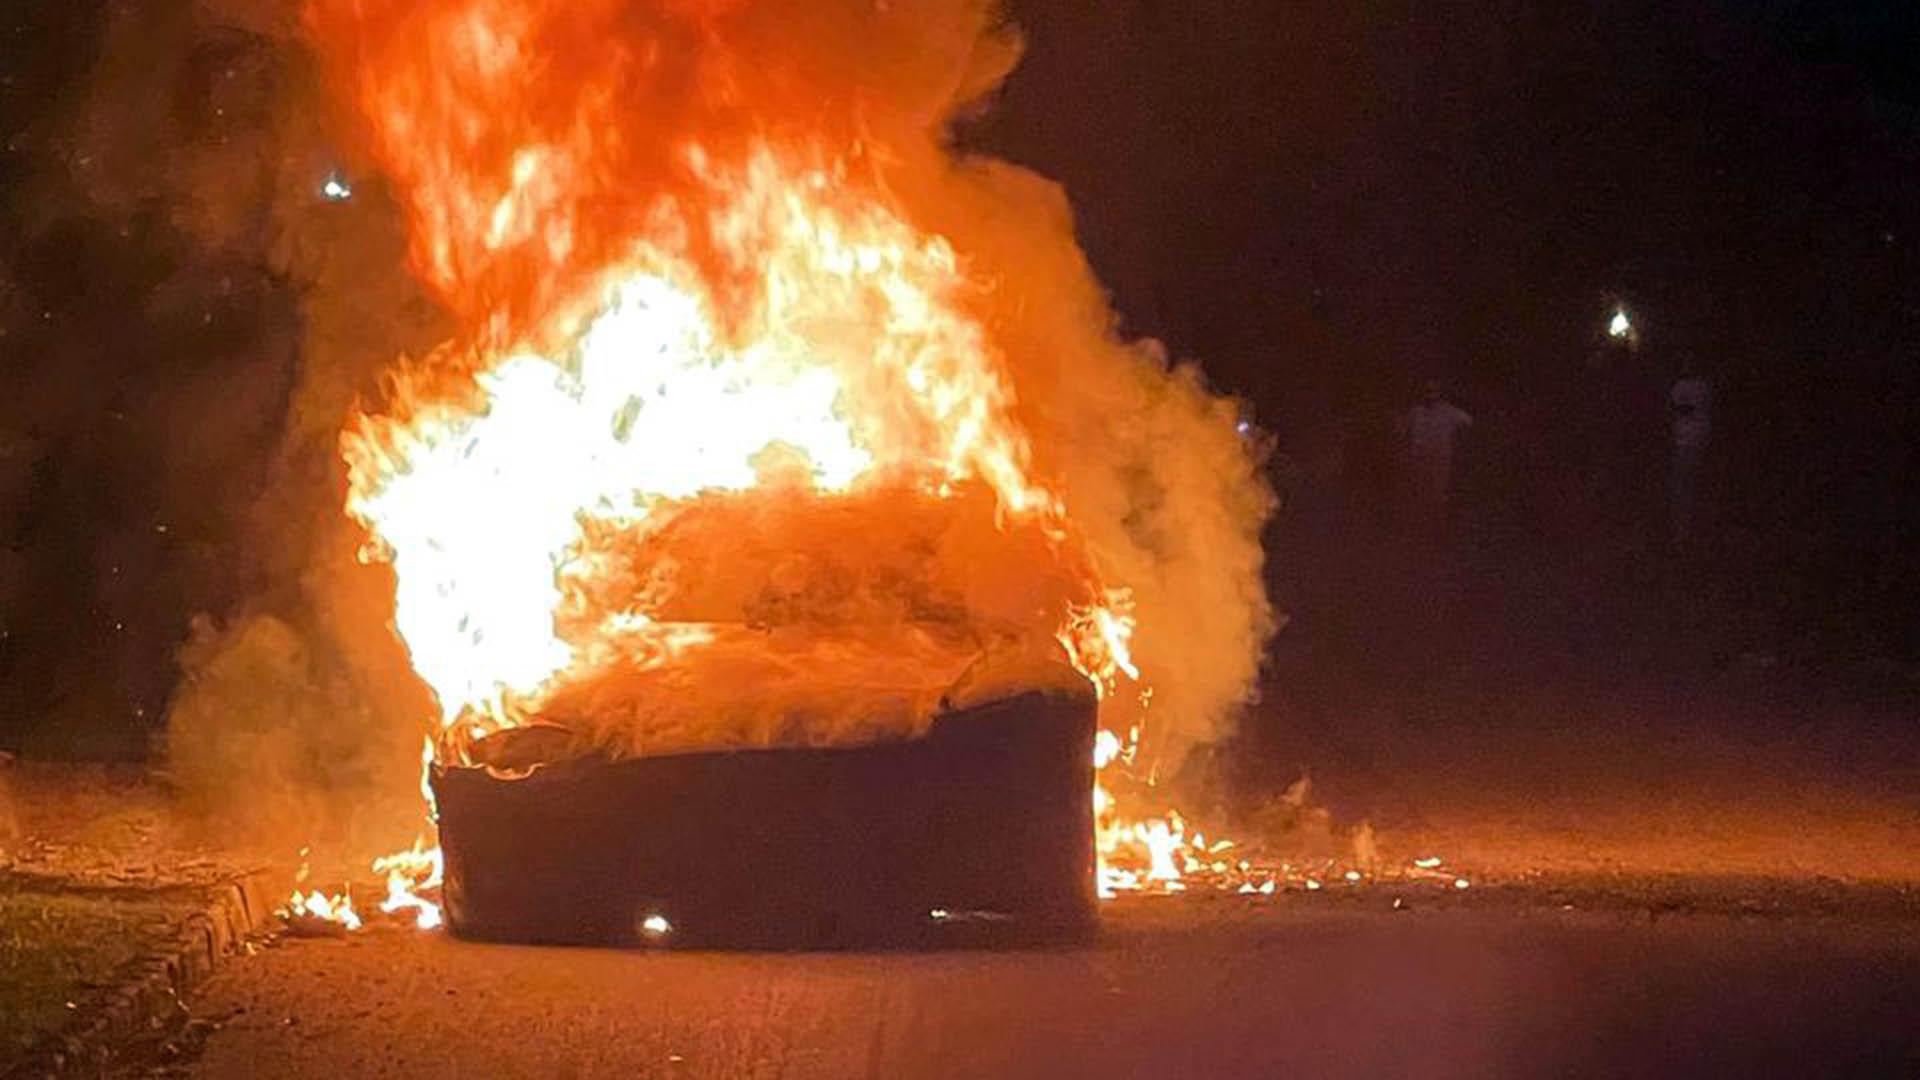 Tesla: Ένα ακόμη μοντέλο της τυλίχτηκε στις φλόγες εν κινήσει (pics)